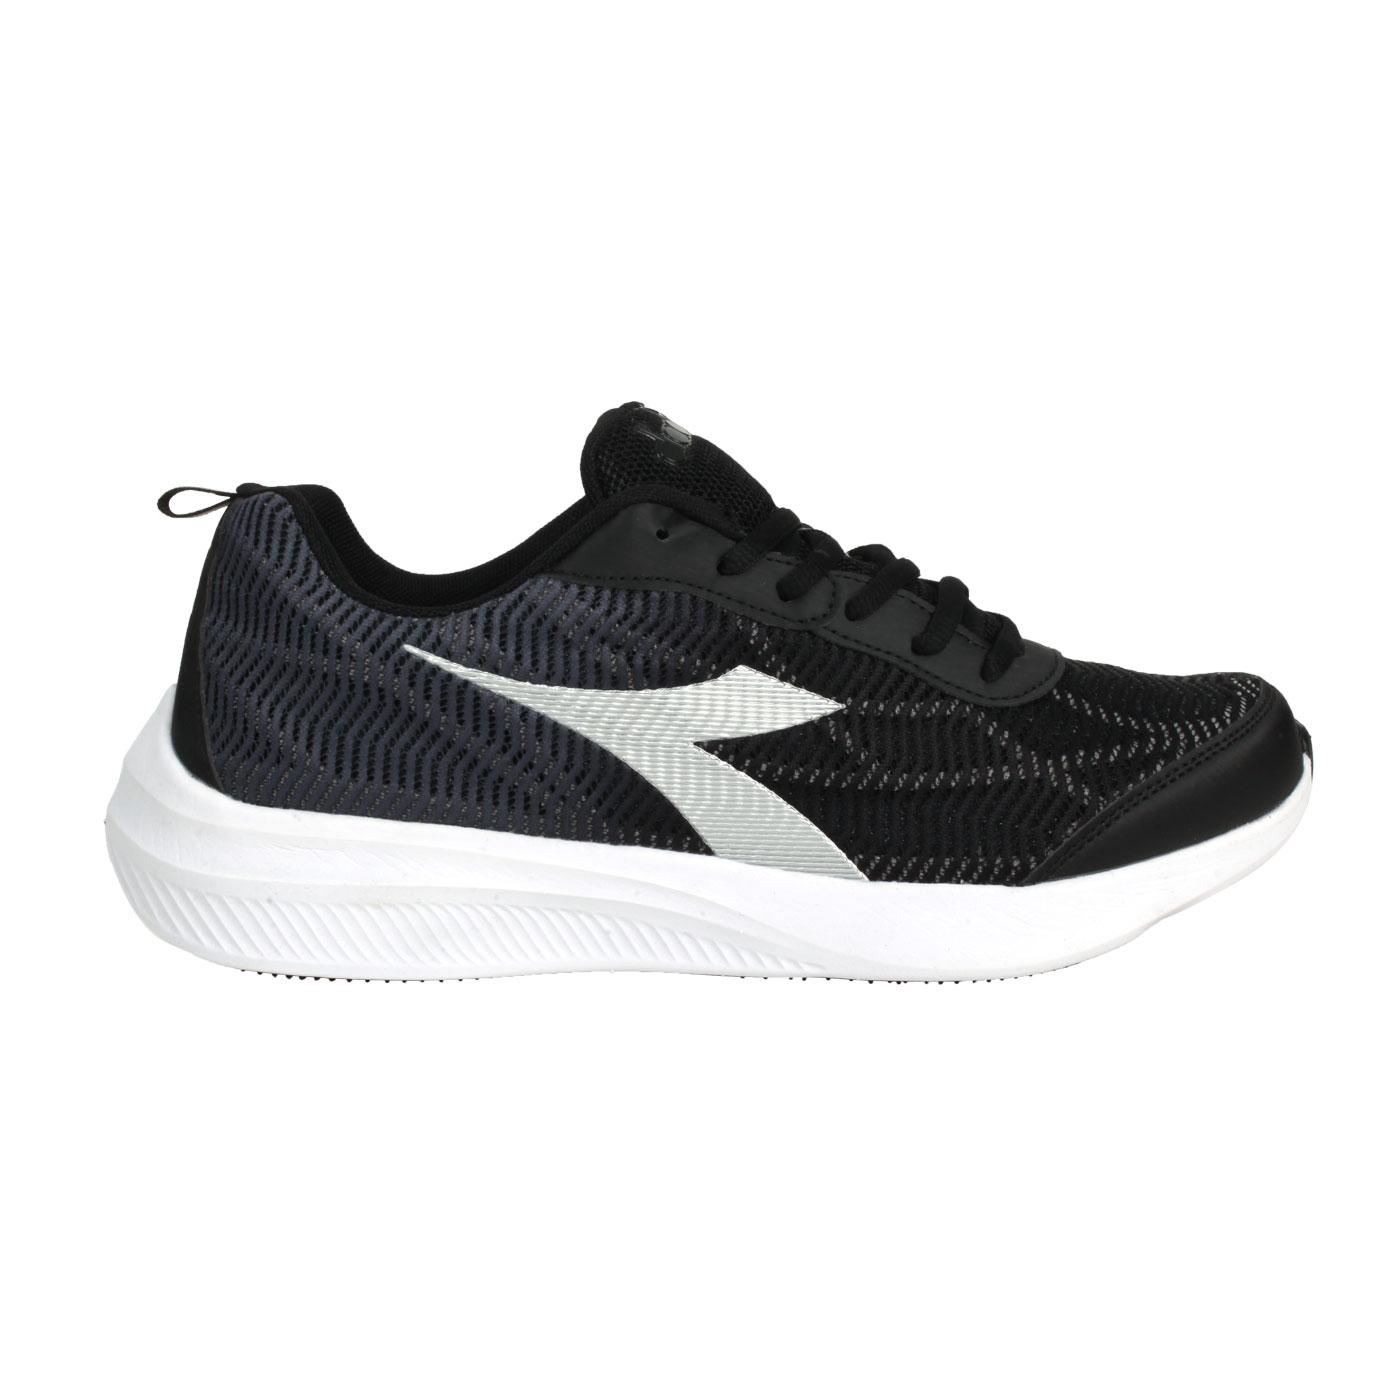 DIADORA 男款專業輕量慢跑鞋 DA71170 - 黑銀